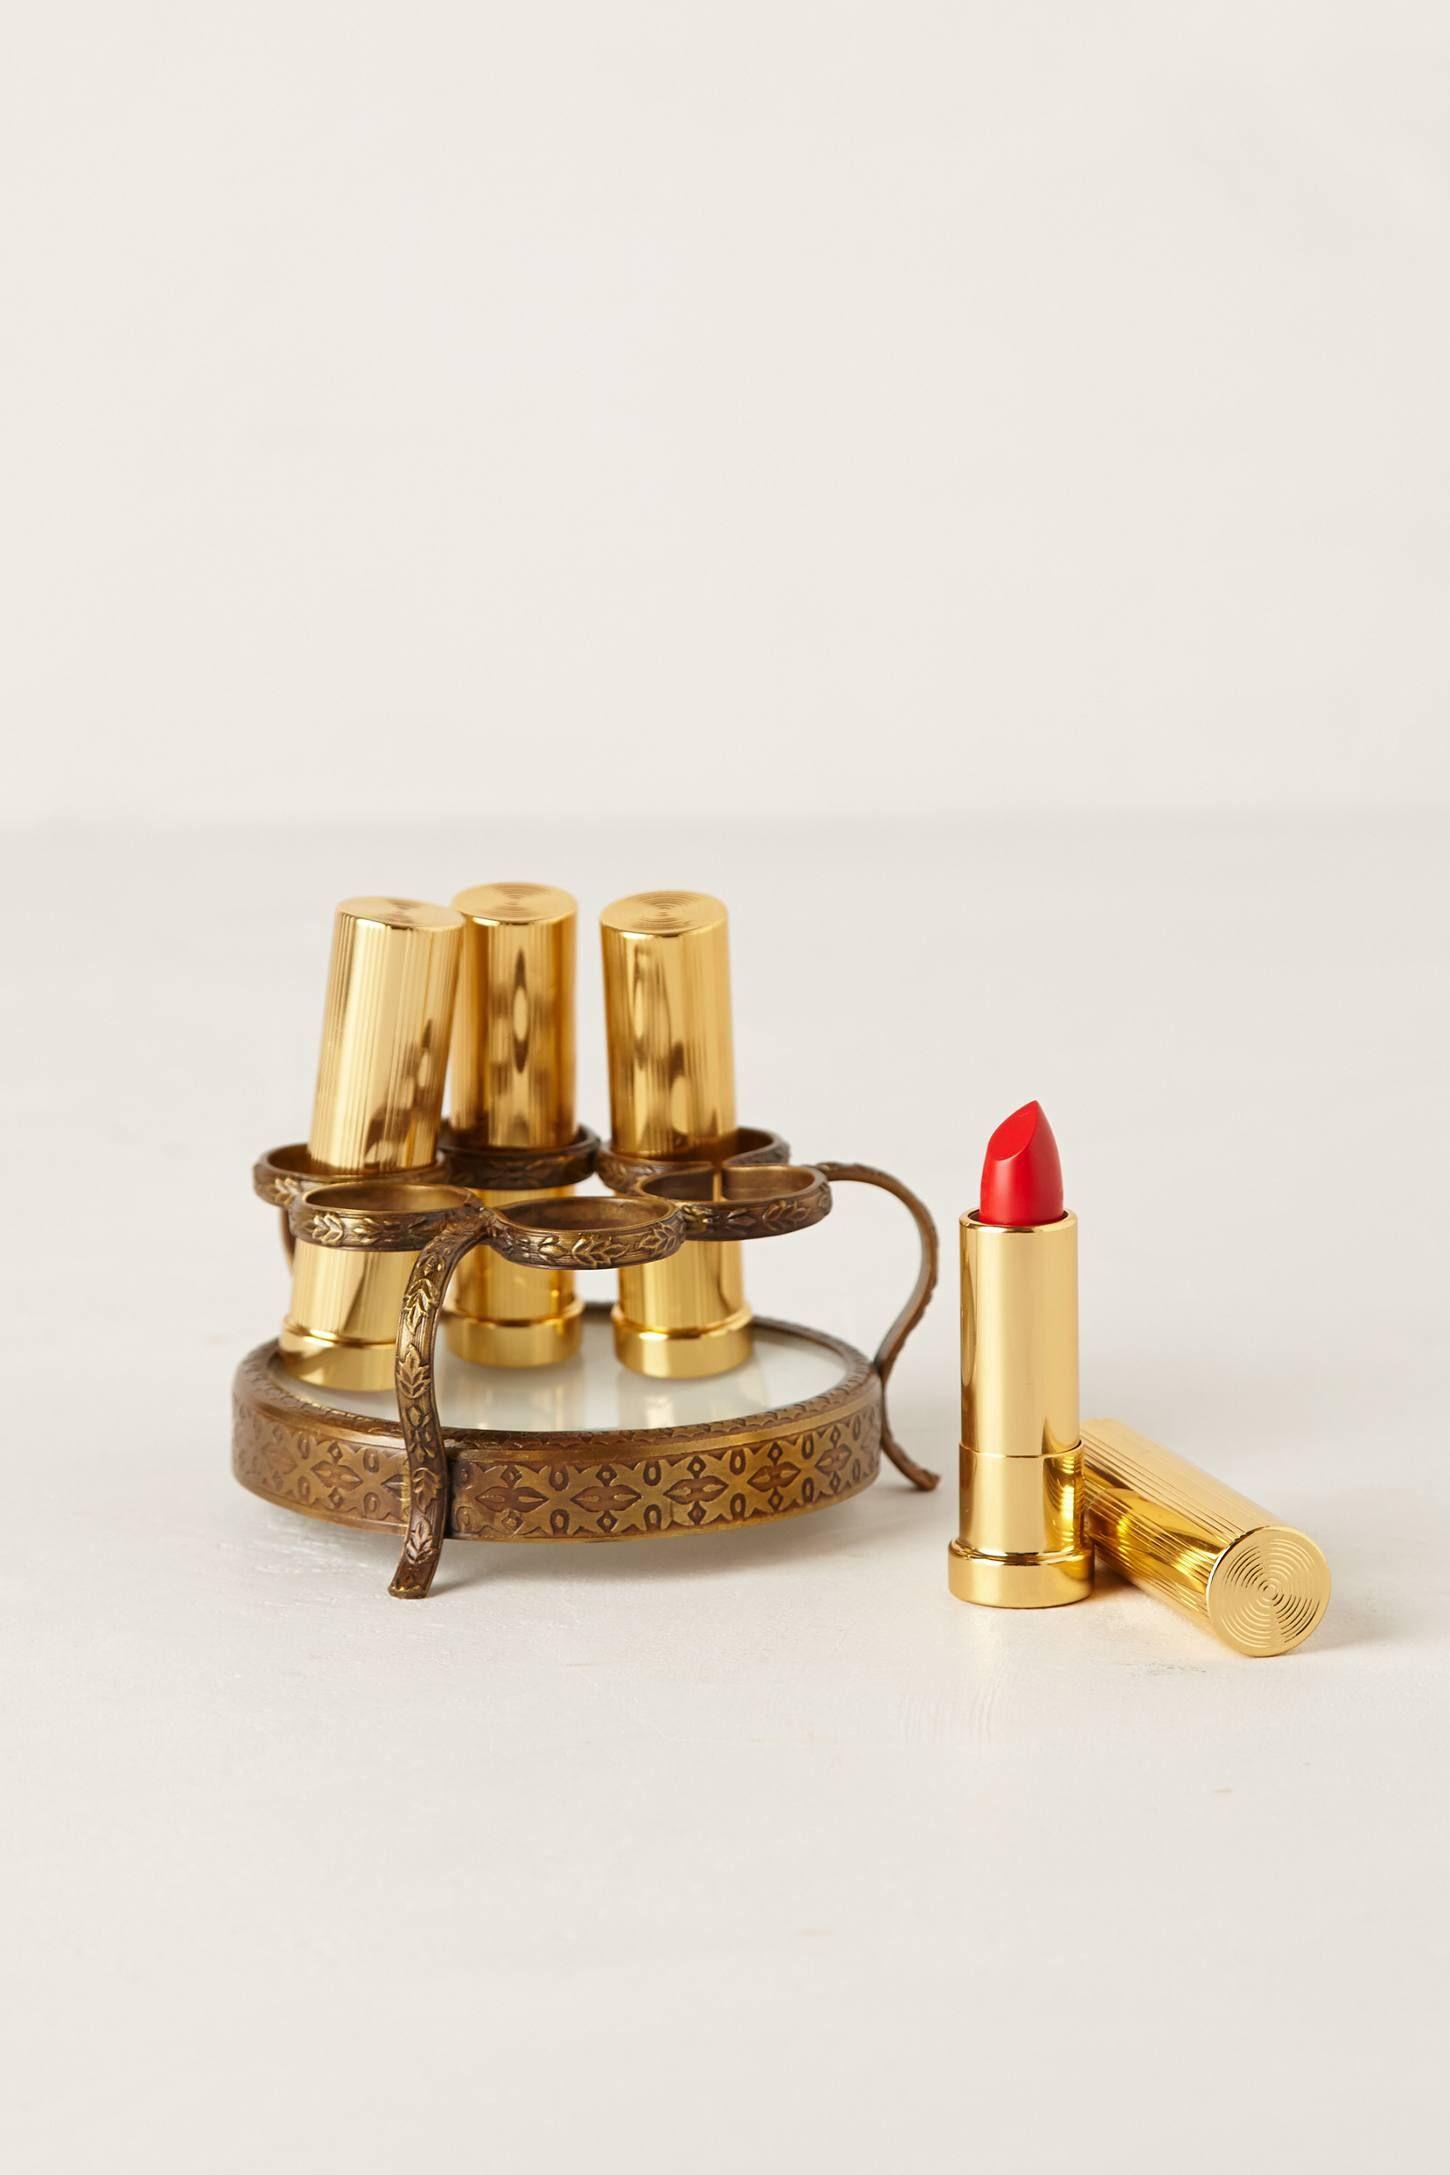 Round Vestige Lipstick Holder Lipstick holder, Lipstick